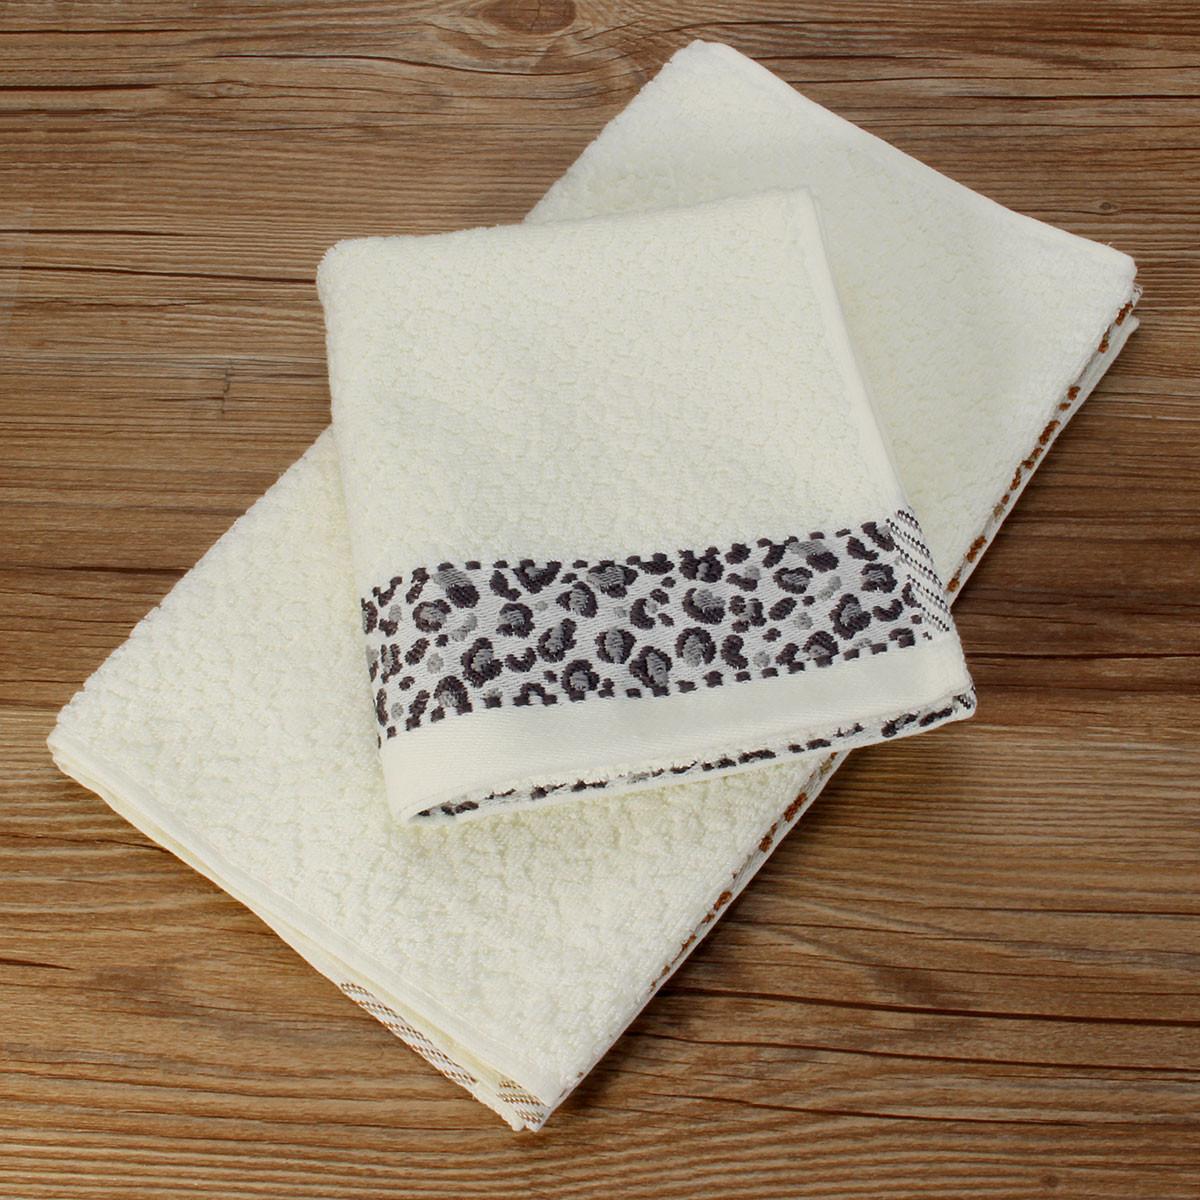 33x74cm Jacquard Cotton Towel Bathroom Absorbent Face Cloth Shower Washcloth